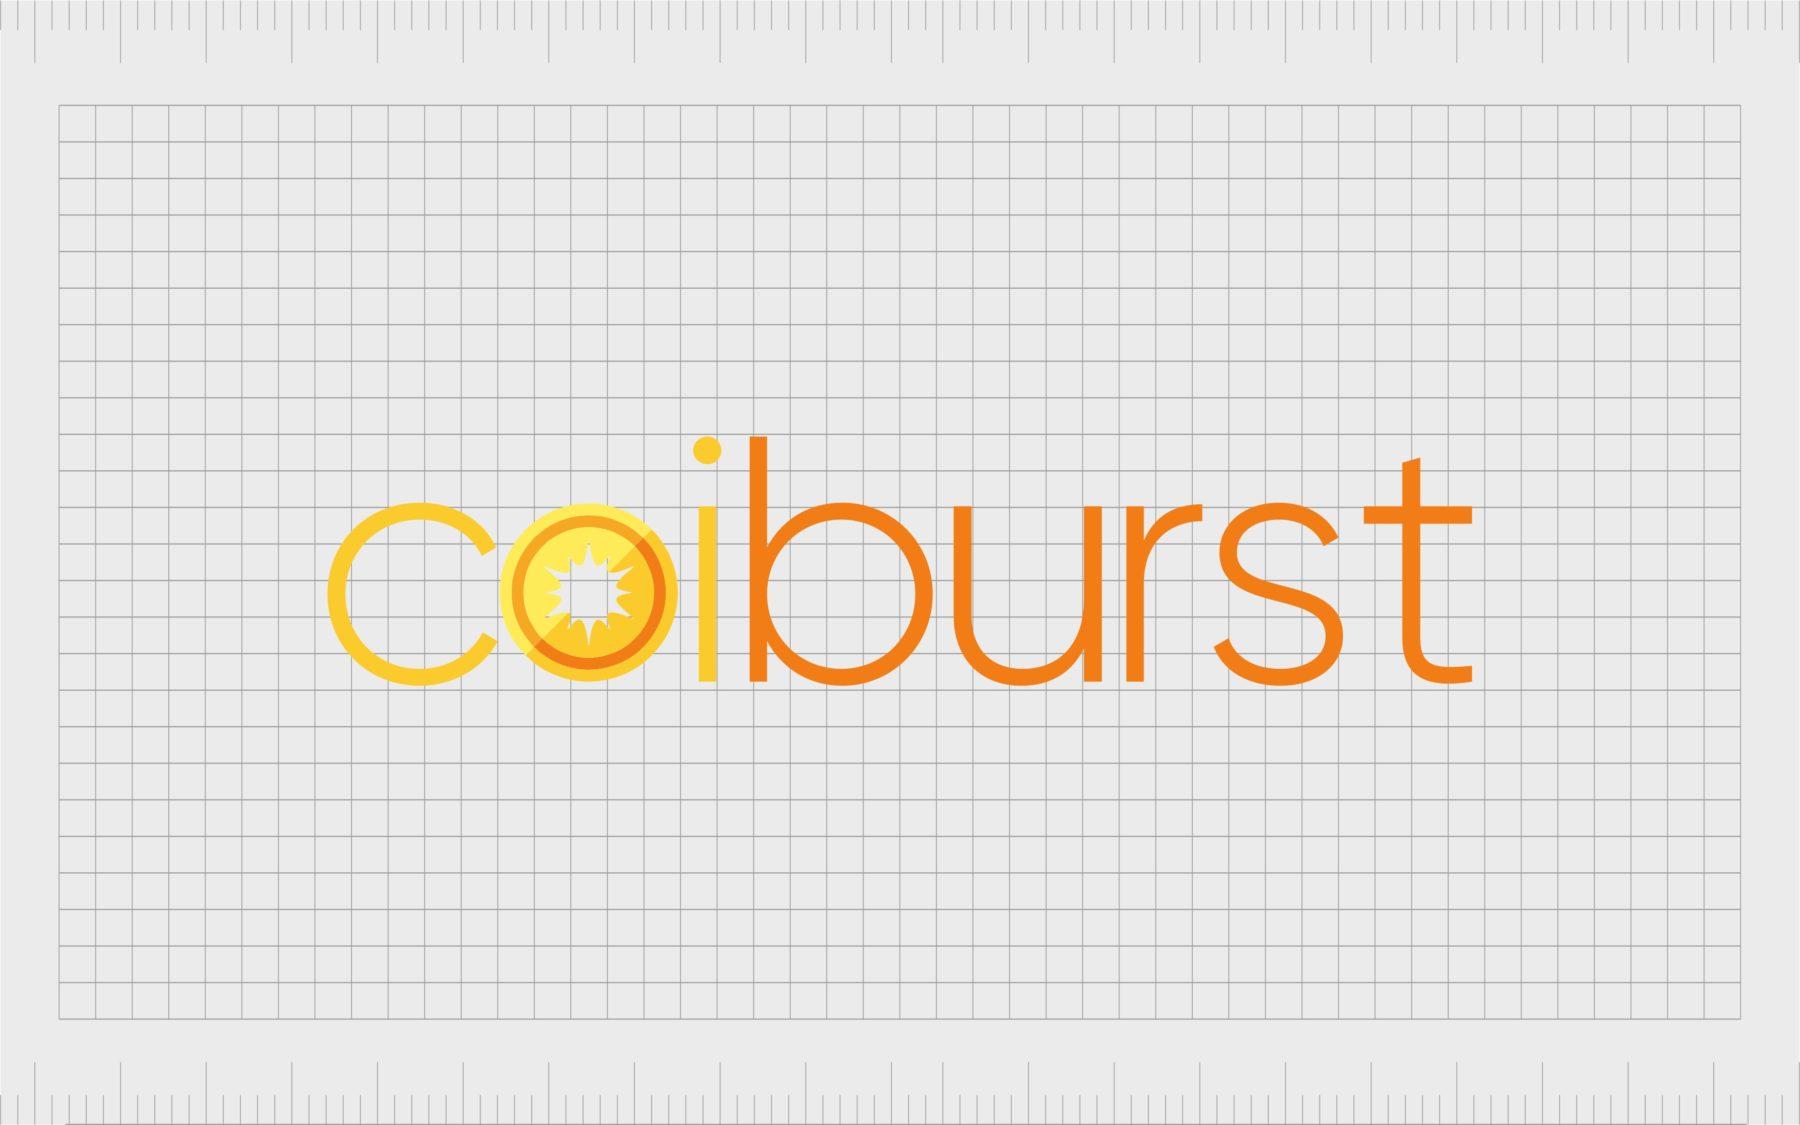 Coiburst